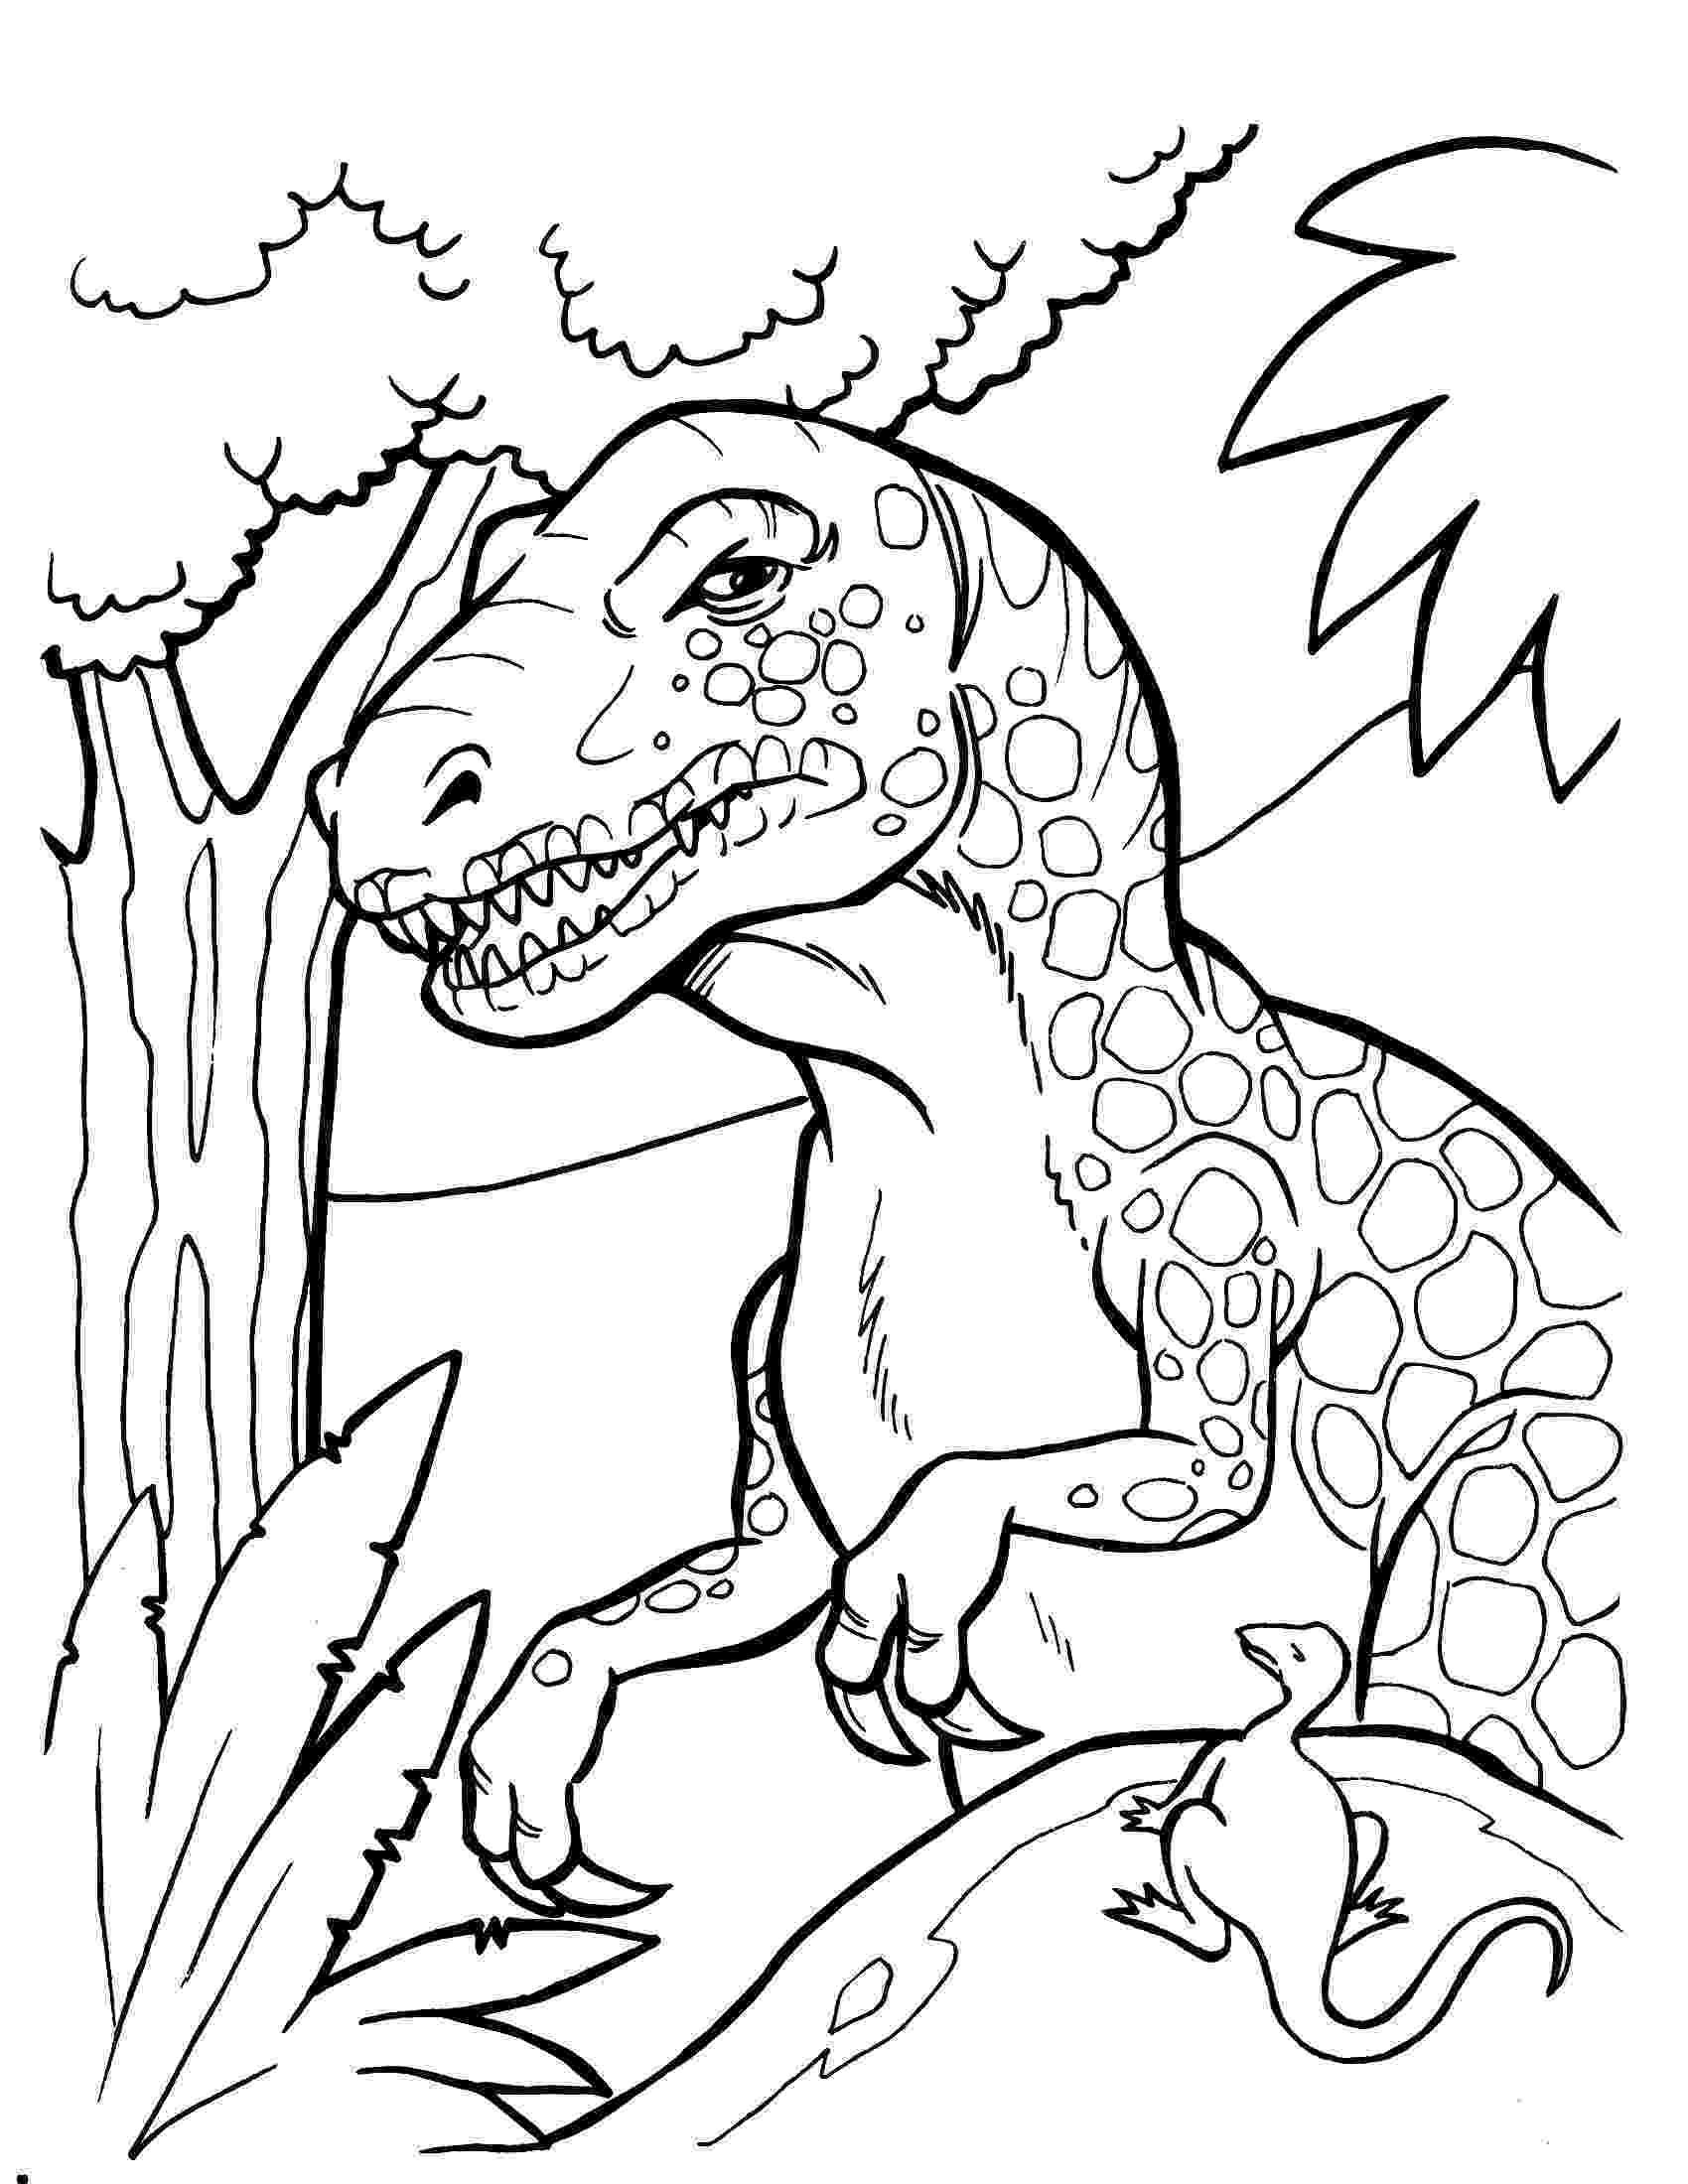 dinosaur printables coloring pages dinosaur free printable coloring pages printables dinosaur